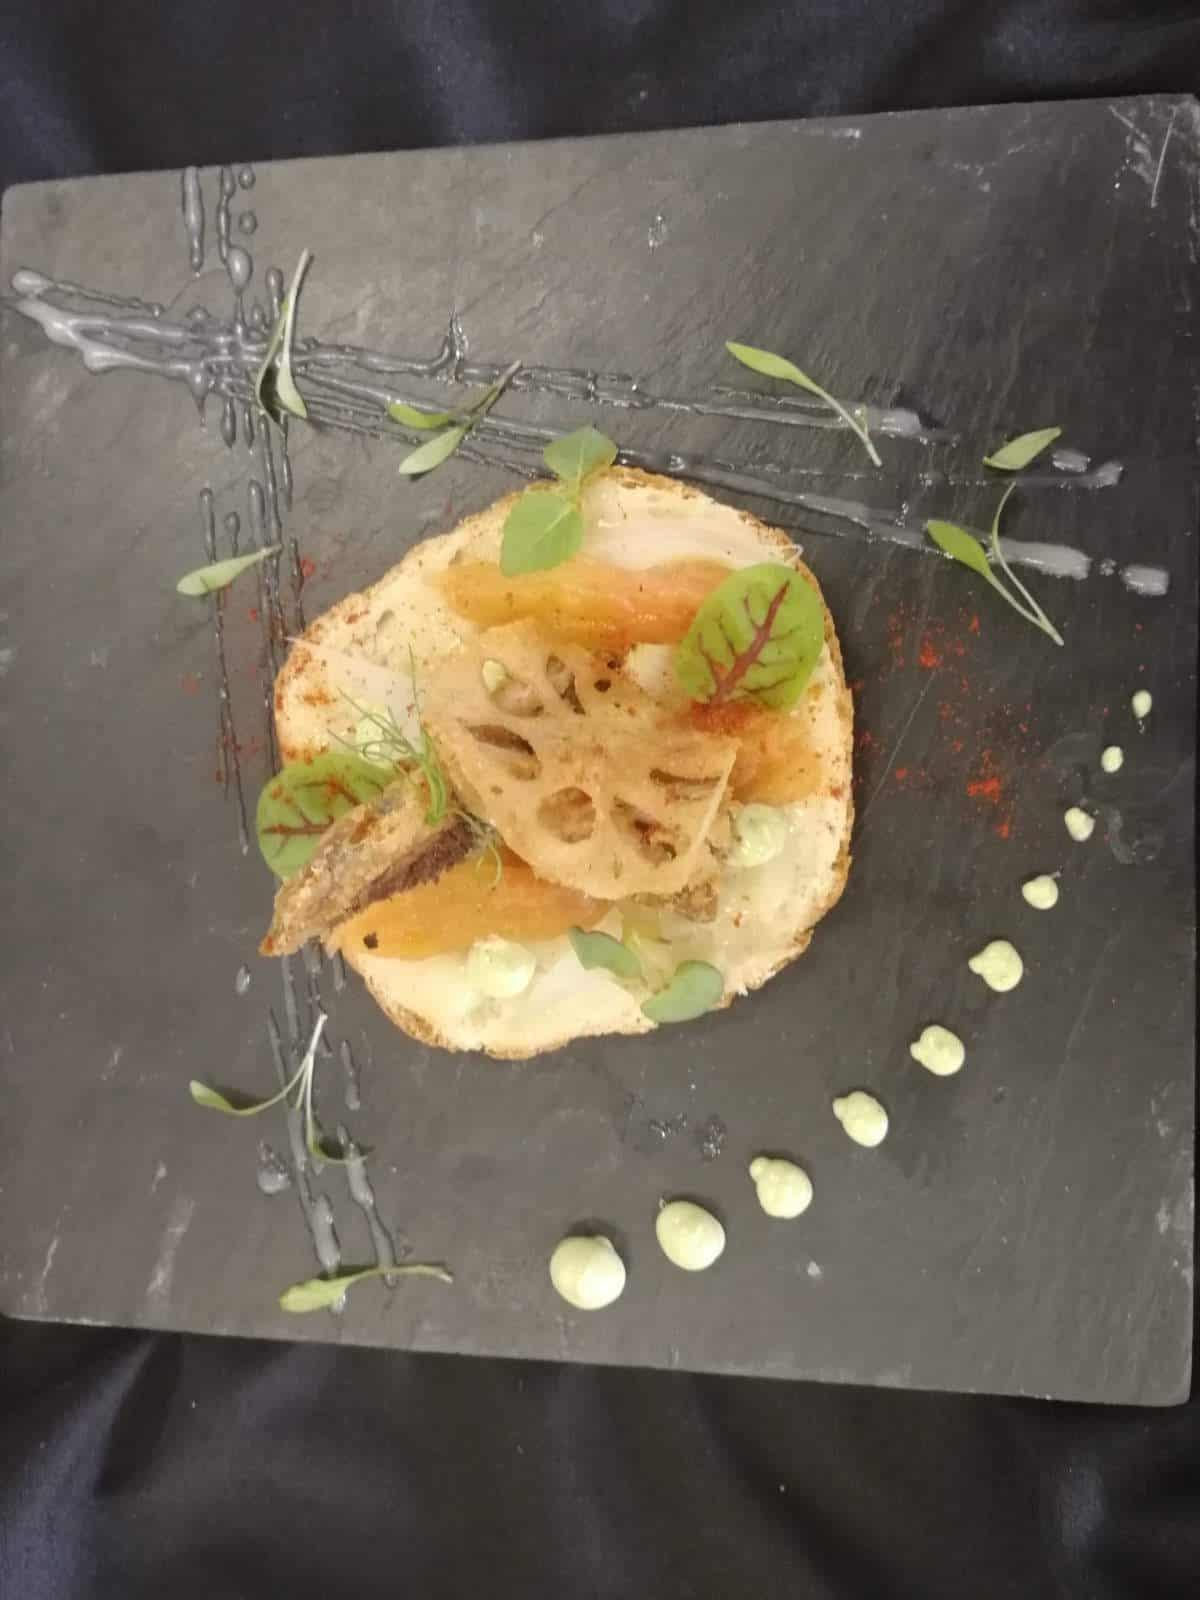 escuela-cocina-villa-retiro-cursos-chef-marianzo-gonzalvo-estrella-michelin-clases-cultura-gastronomica-fp-cocina